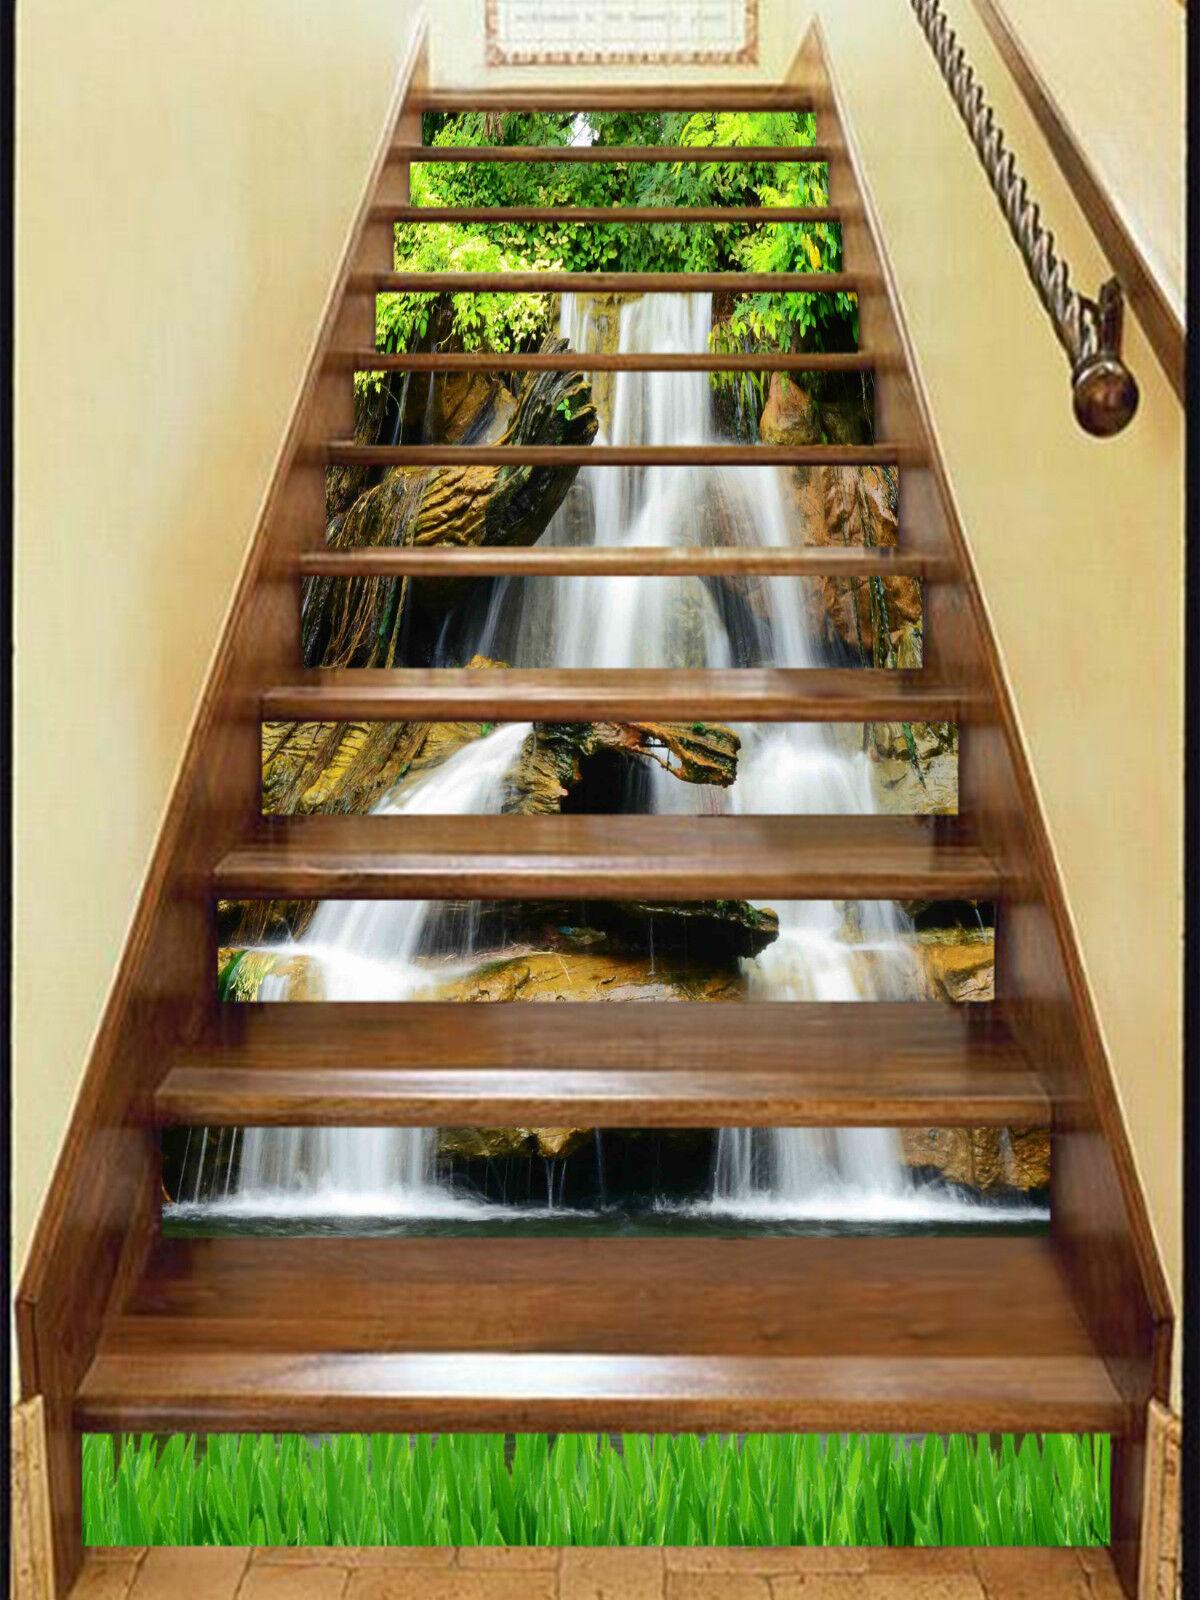 3D Schne Bach 0032 Stair Risers Dekoration Fototapete Vinyl Aufkleber Tapete DE